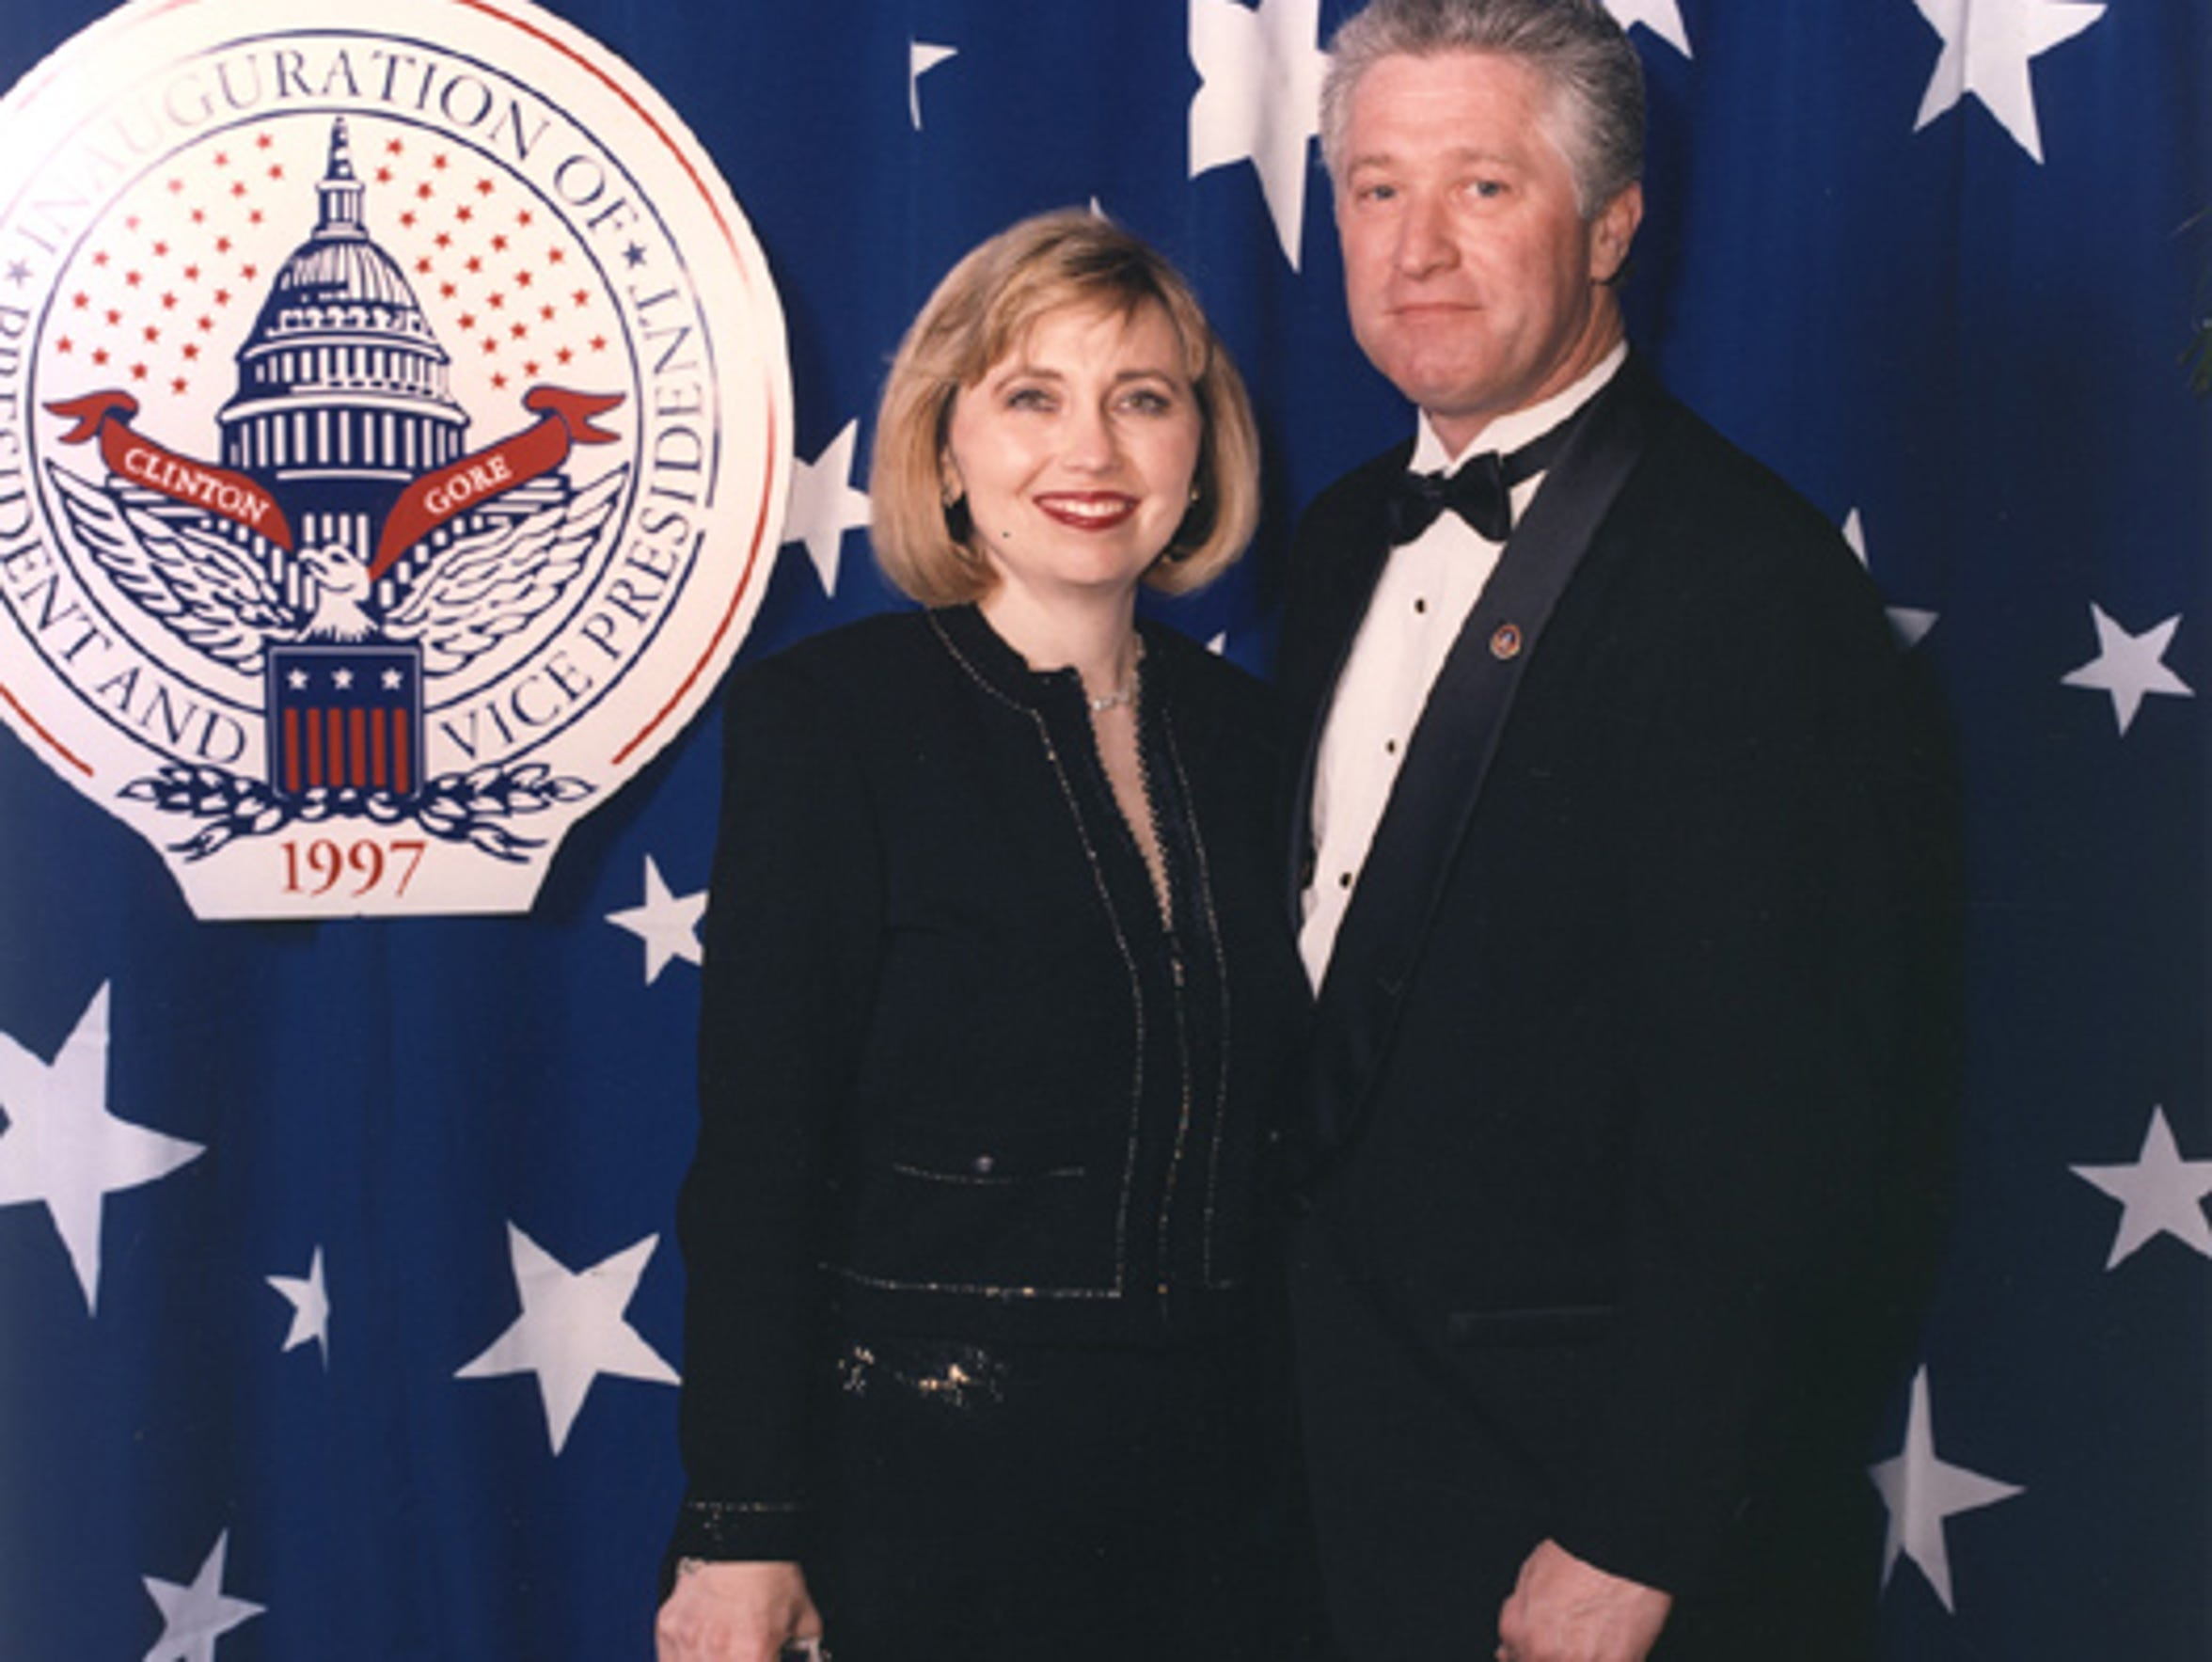 Teresa Barnwell and Pat Rick, who are Hillary and Bill